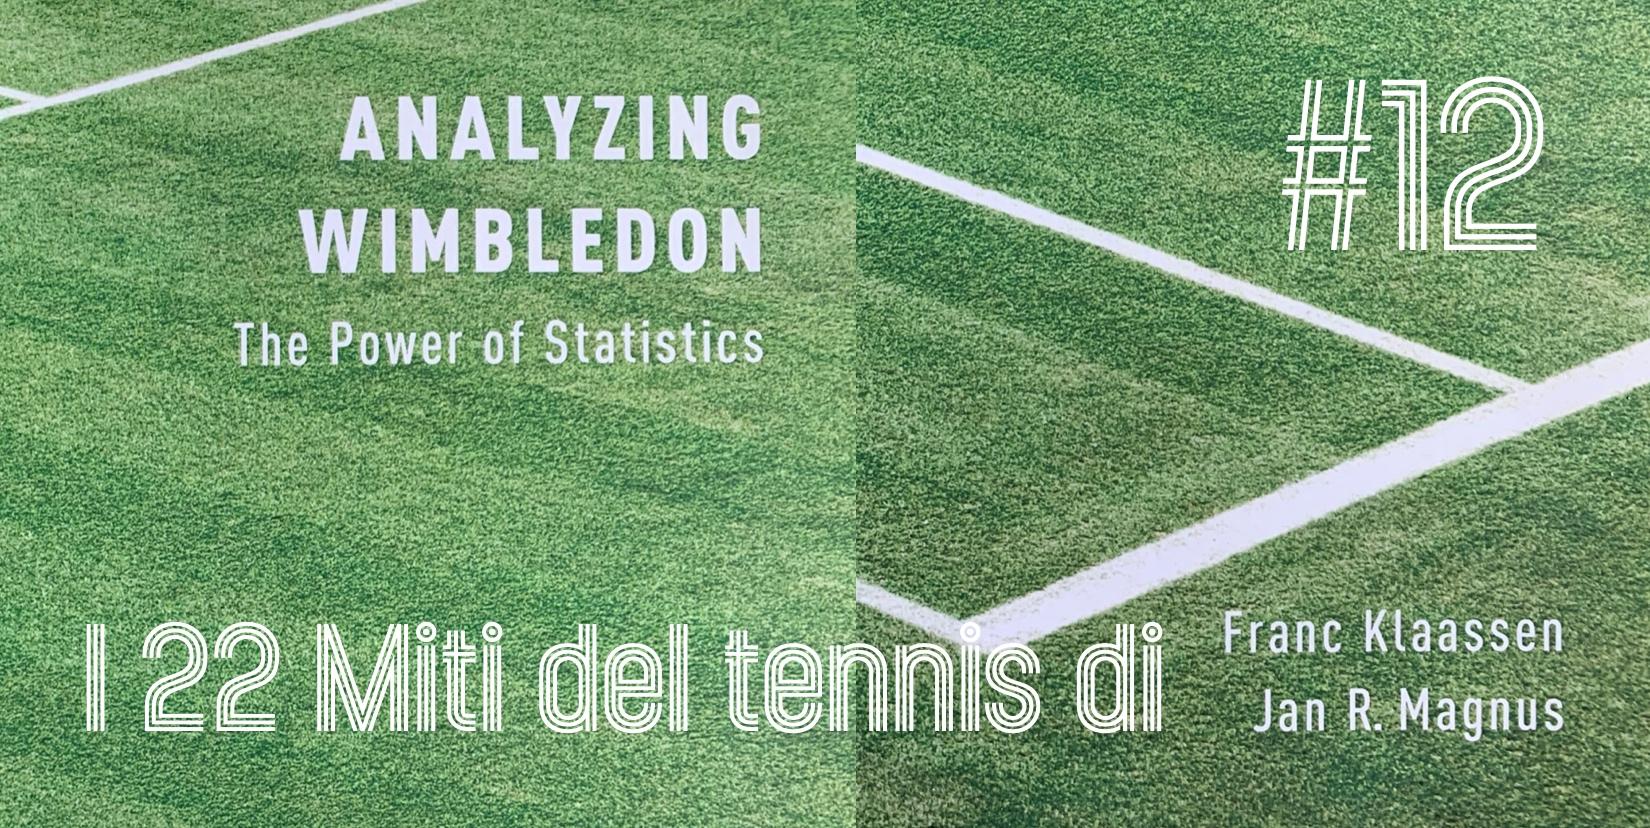 I 22 miti del tennis di Klaassen & Magnus – Mito 12 - settesei.it